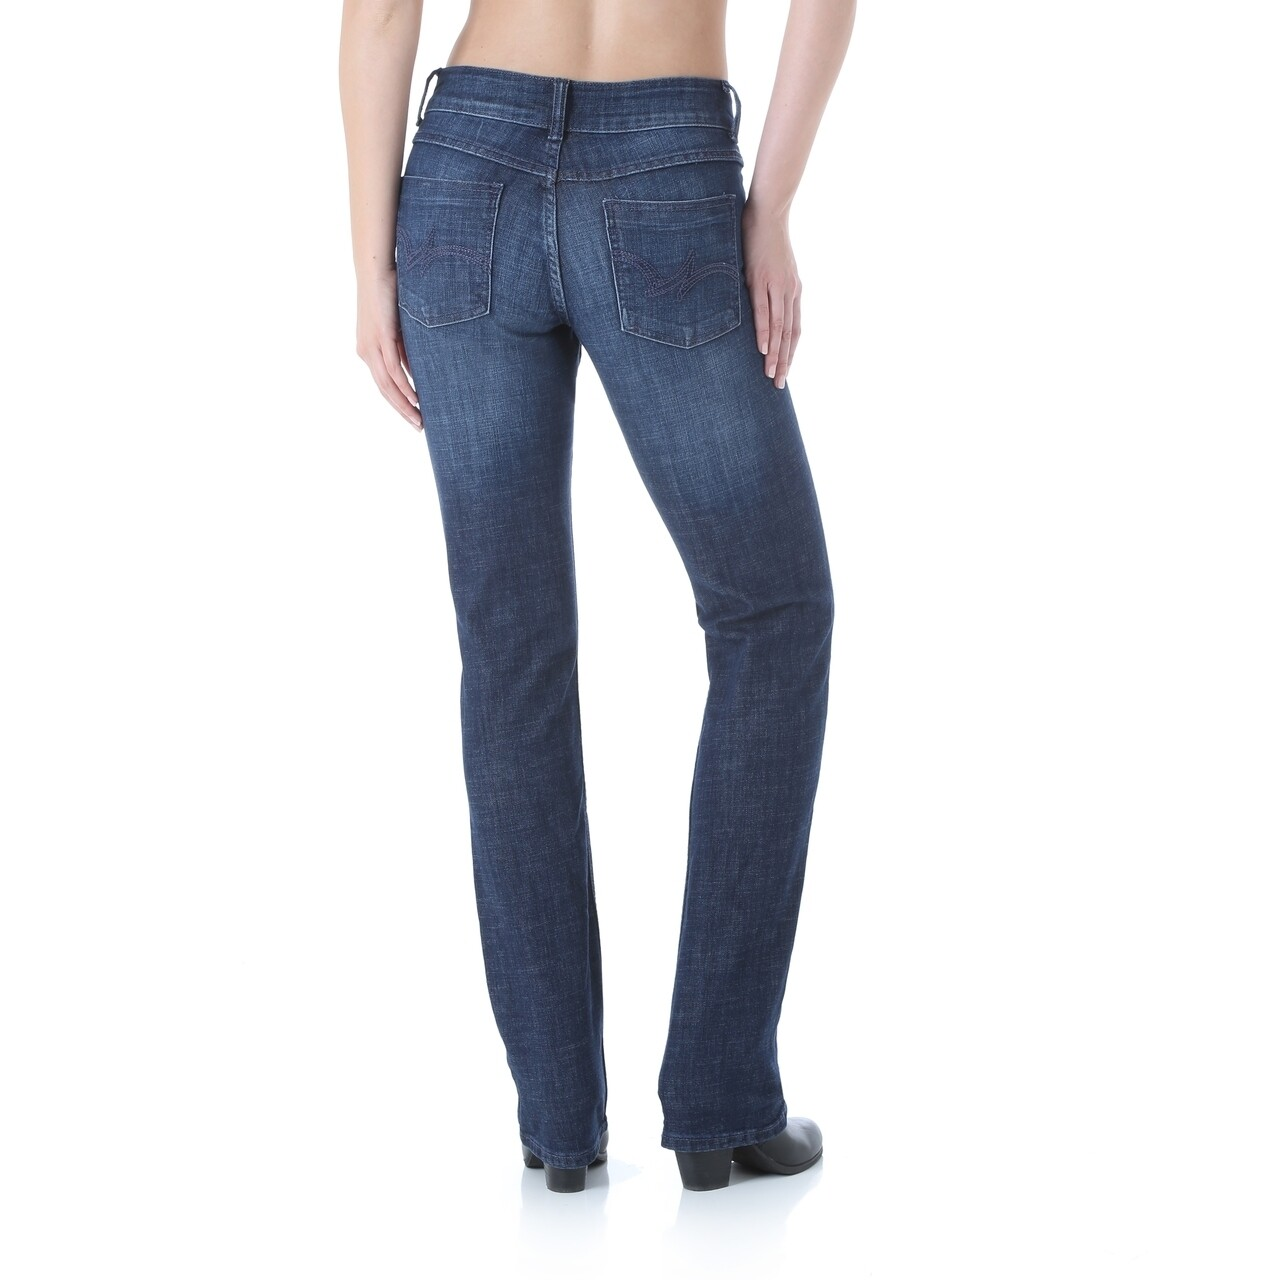 09MWTDS Wrangler Straight Leg Jean Mid Rise